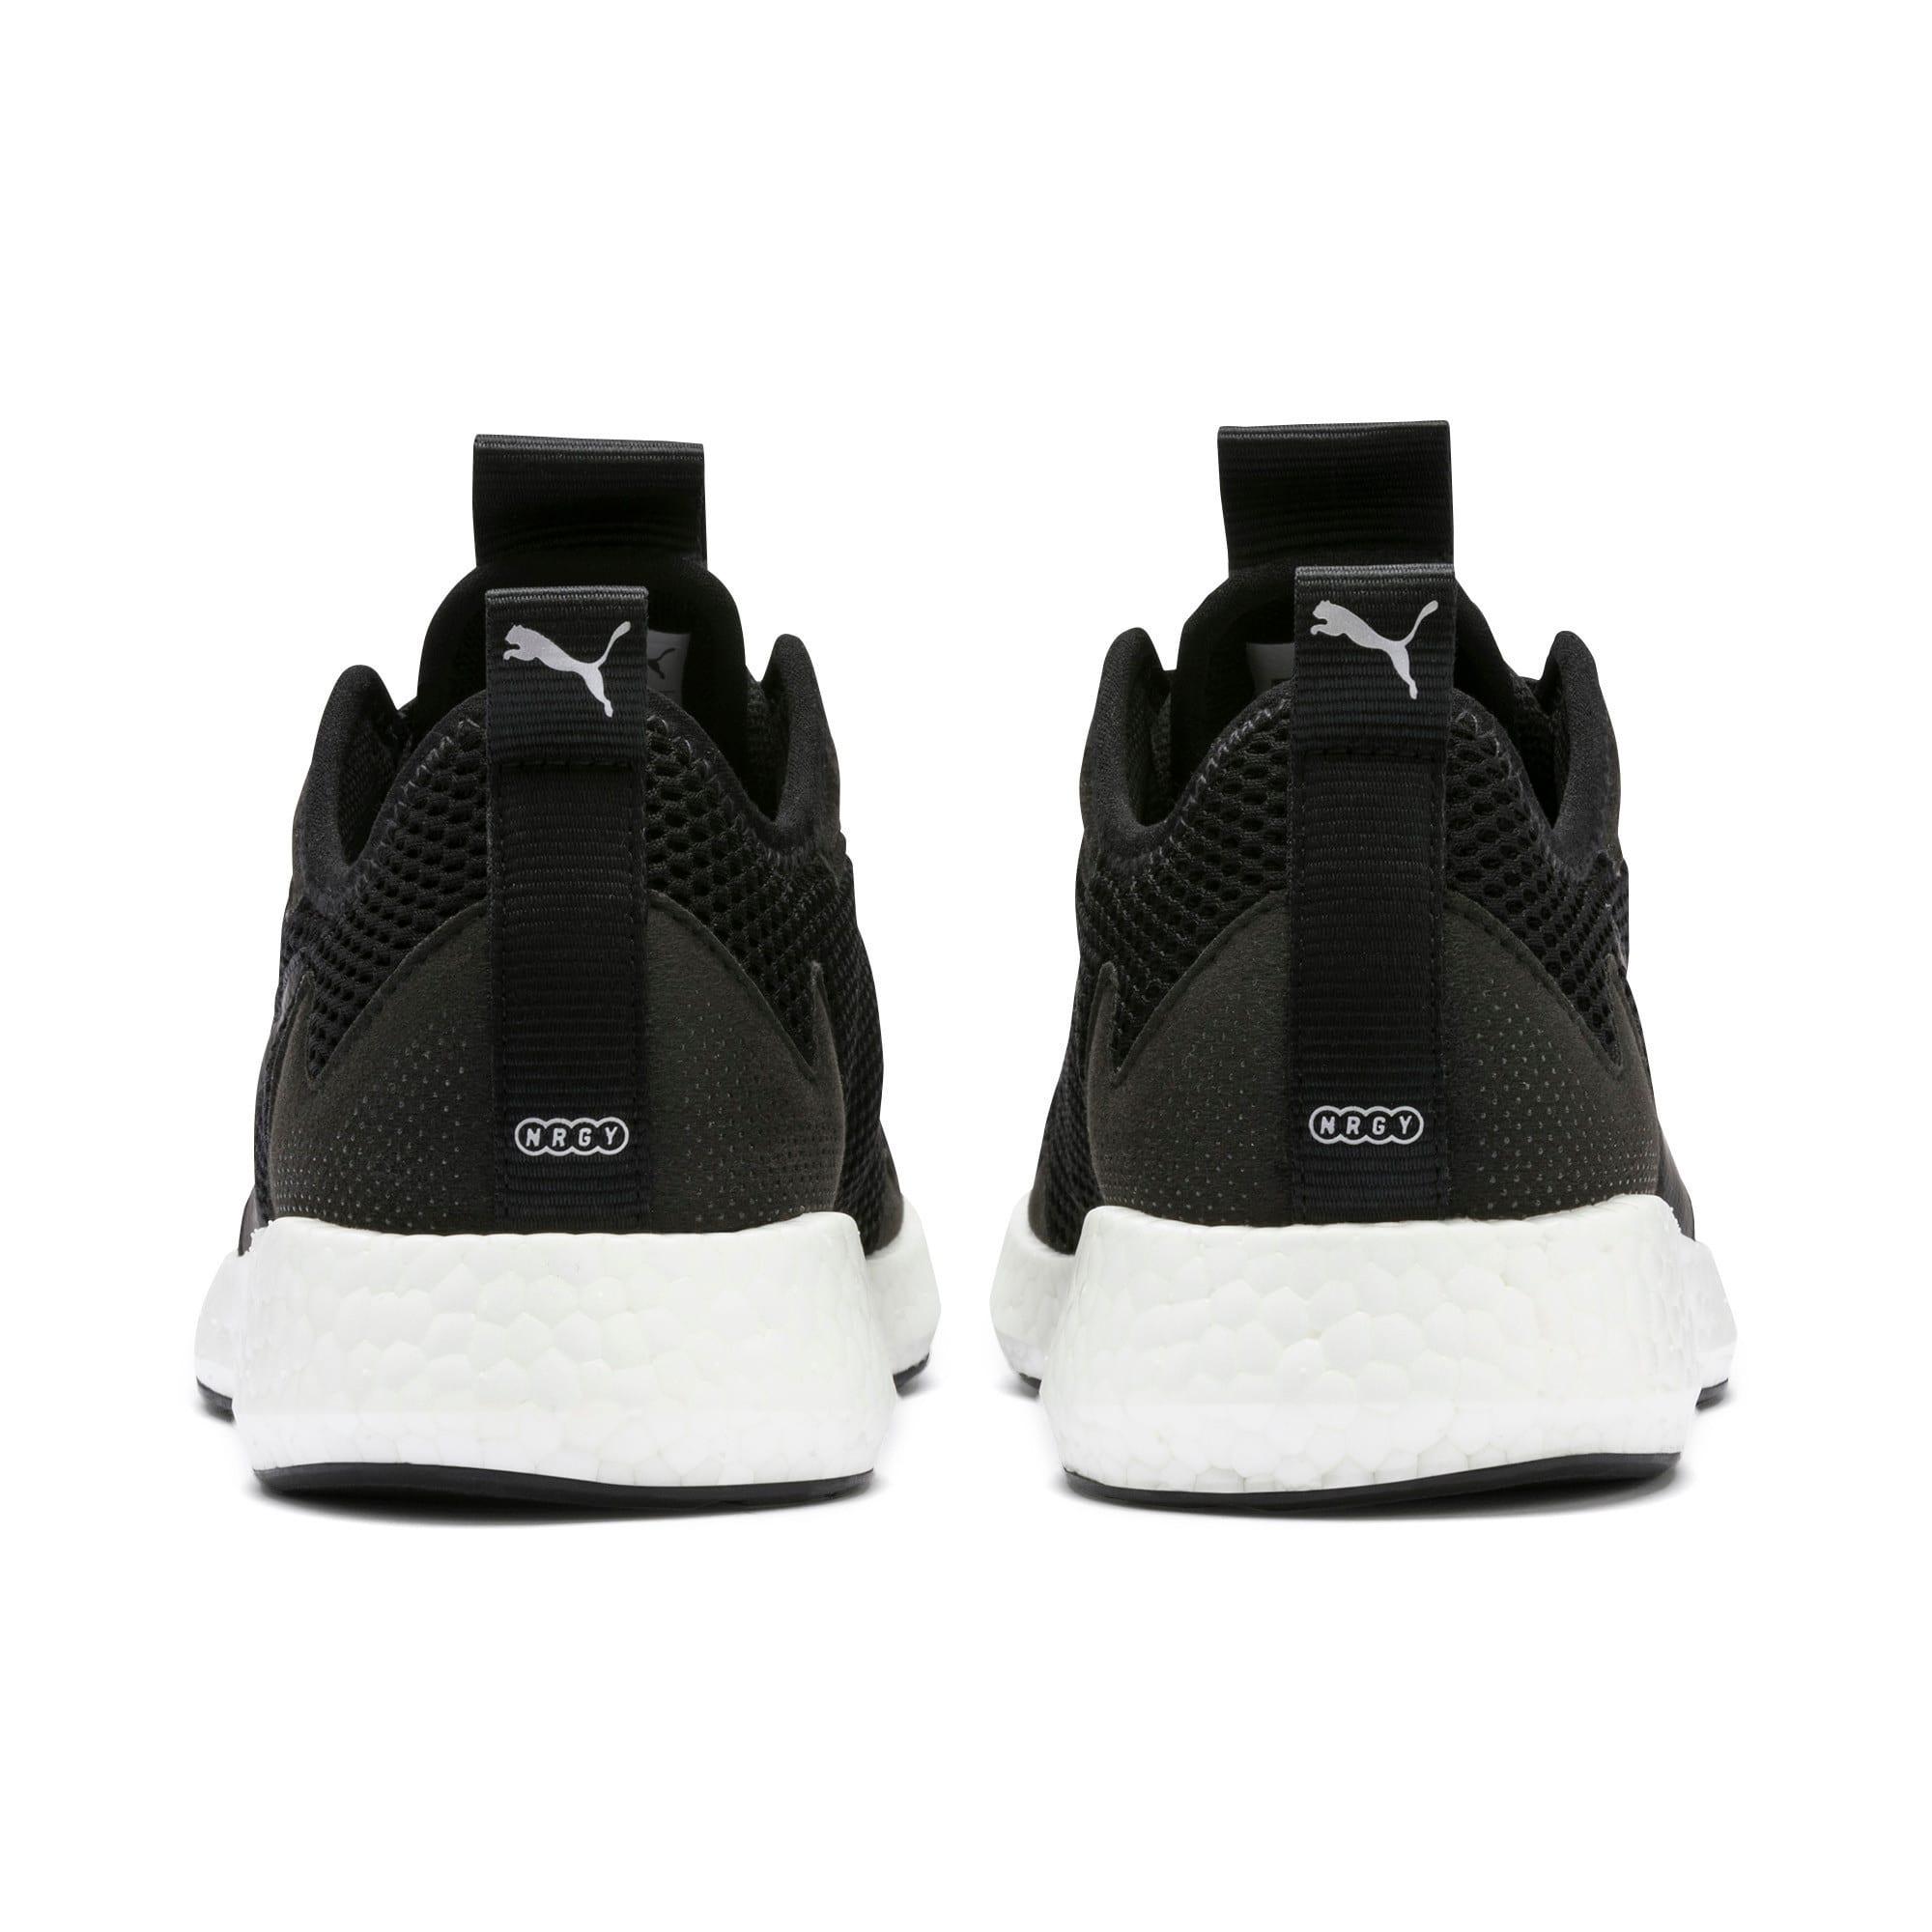 Thumbnail 6 of NRGY Neko Skim Women's Running Shoes, Puma Black-Puma Silver, medium-IND